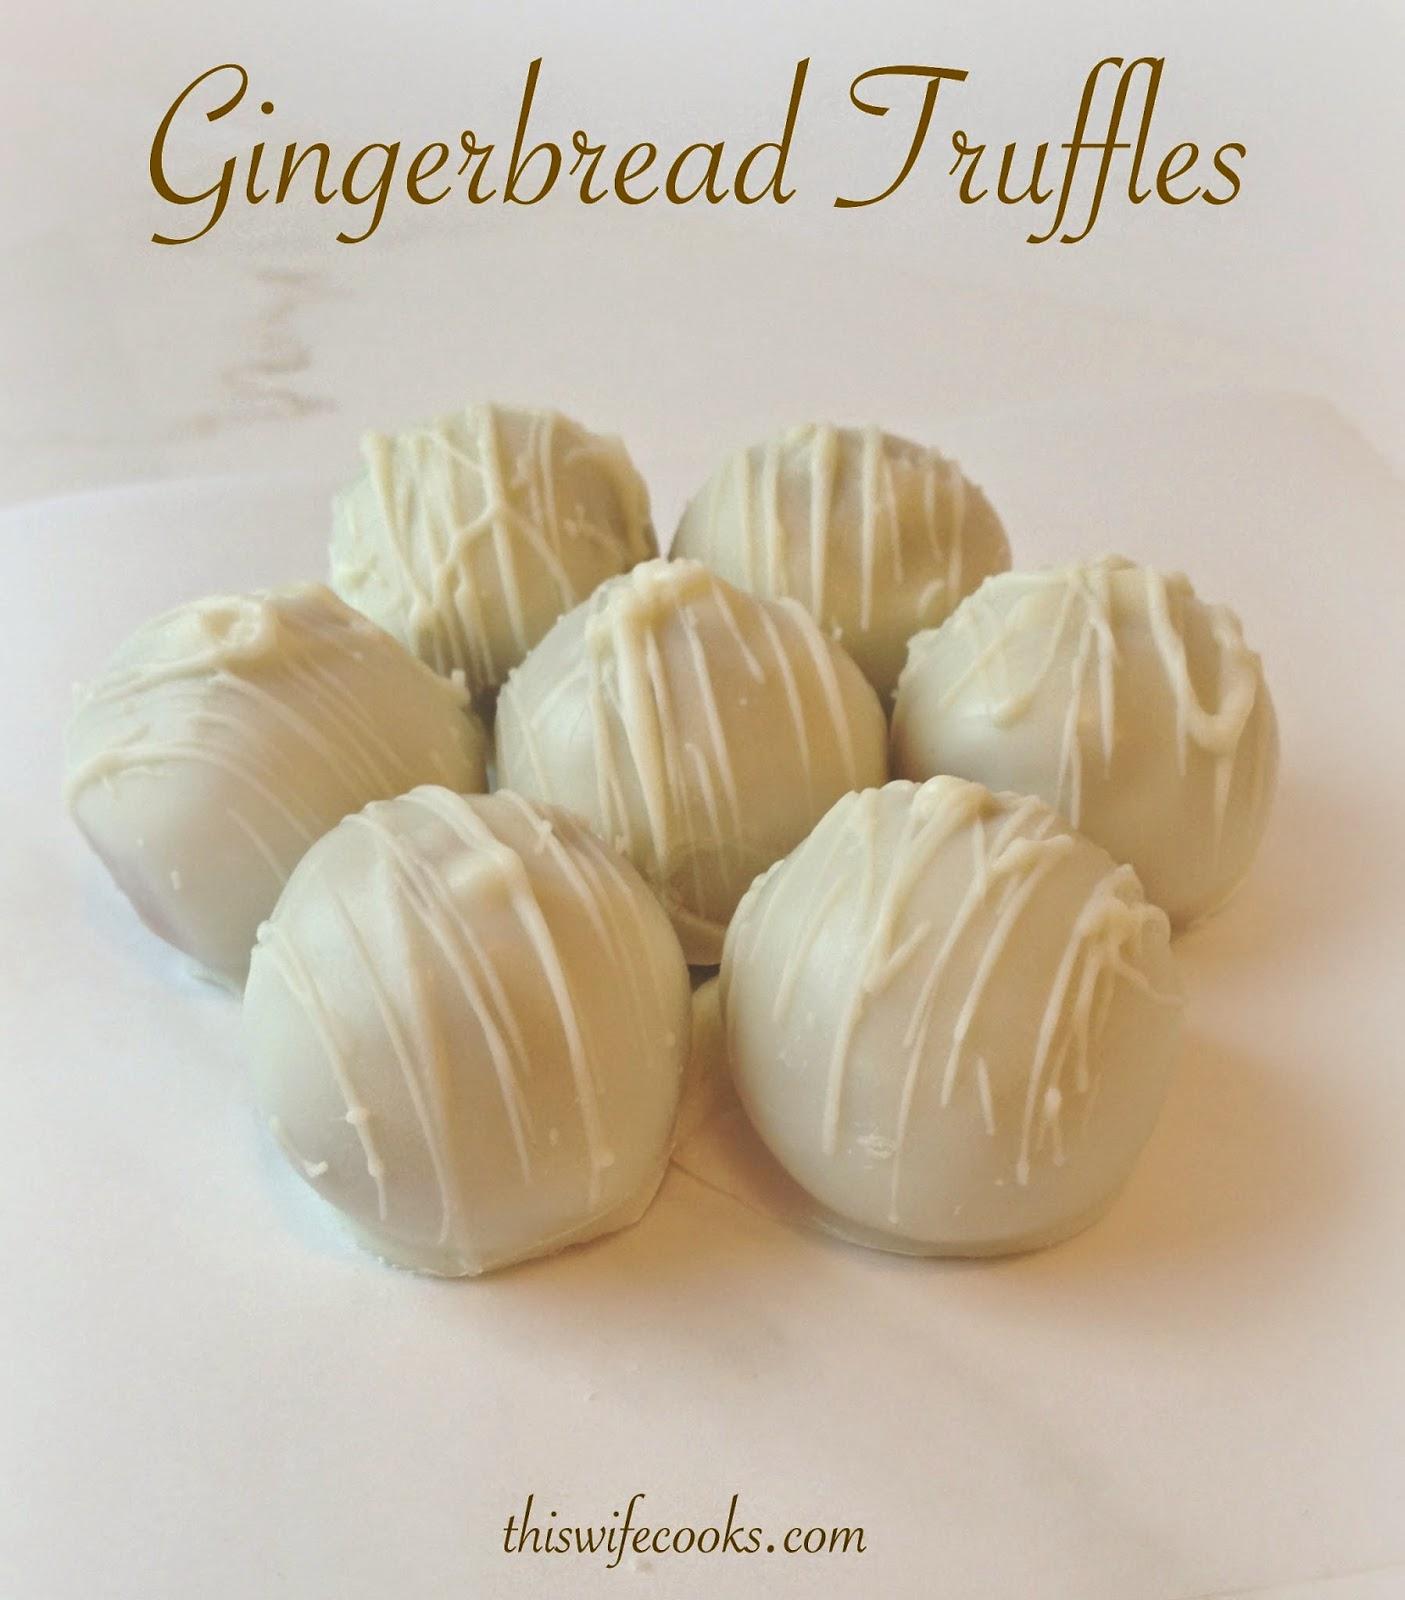 3-Ingredient Gingerbread Truffles   thiswifecooks.com